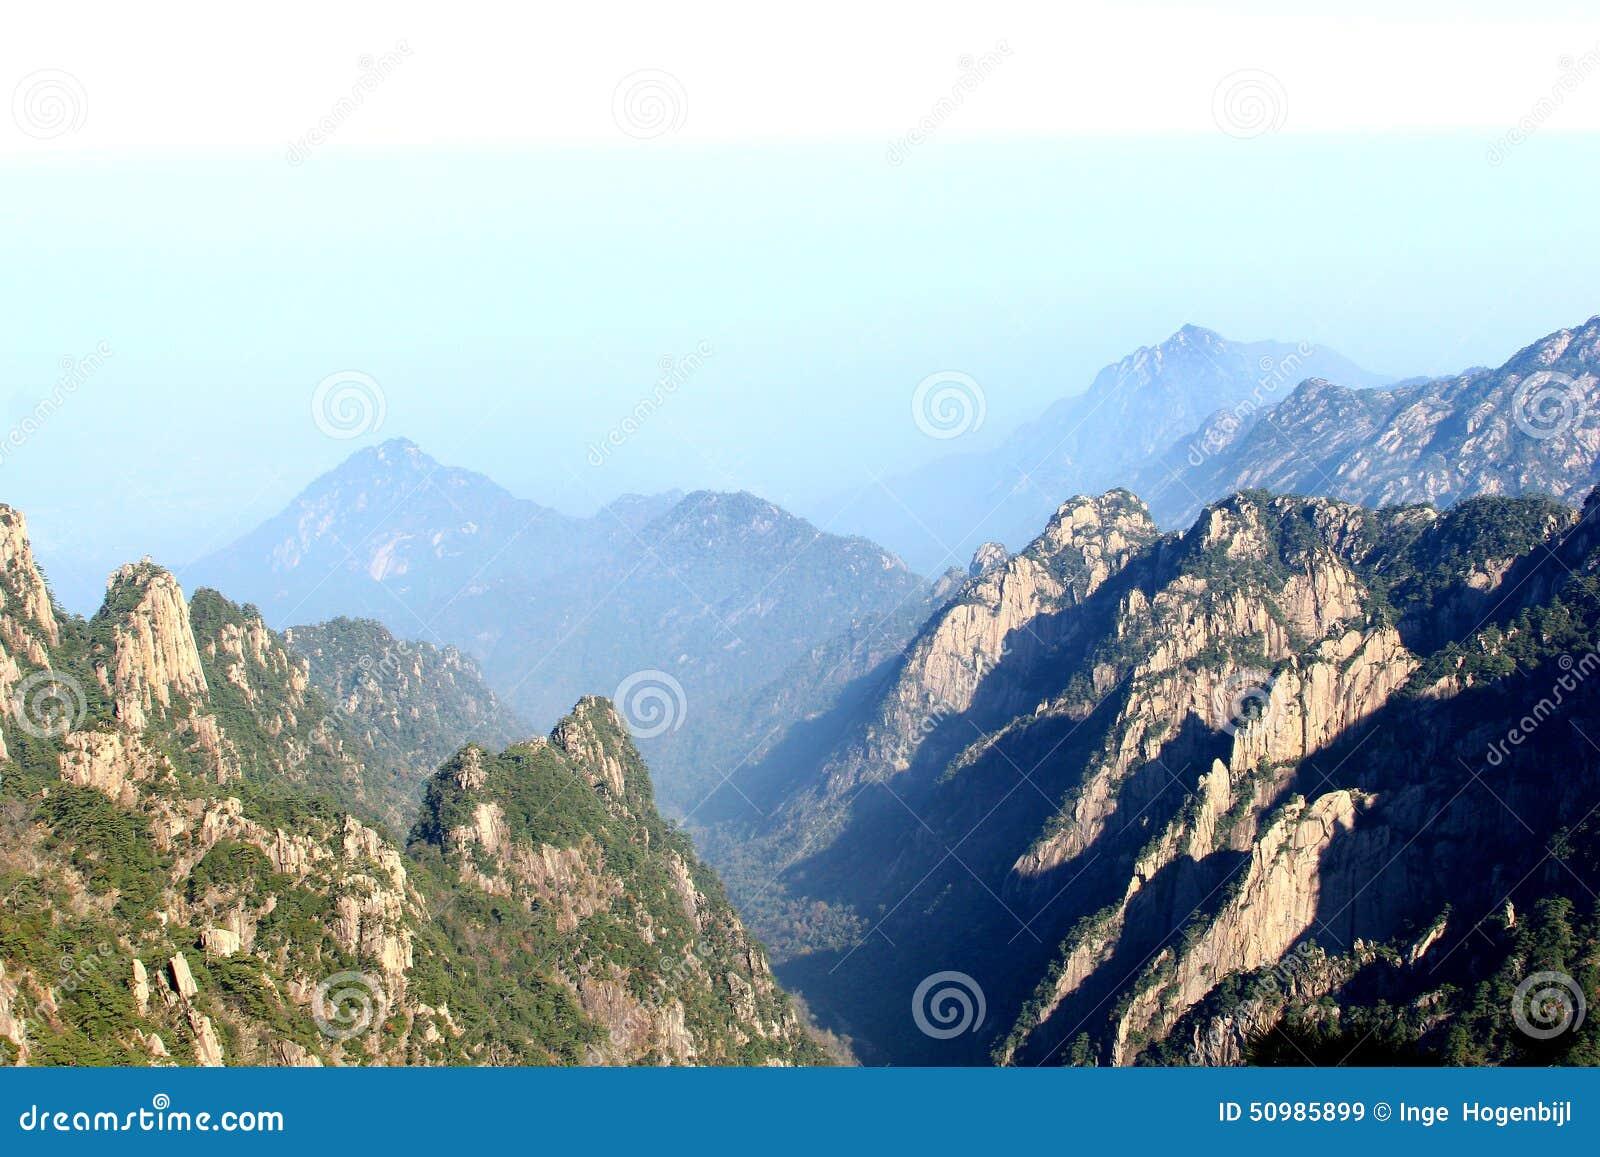 Wonderful view at the Huangshan Yellow Mountains, China